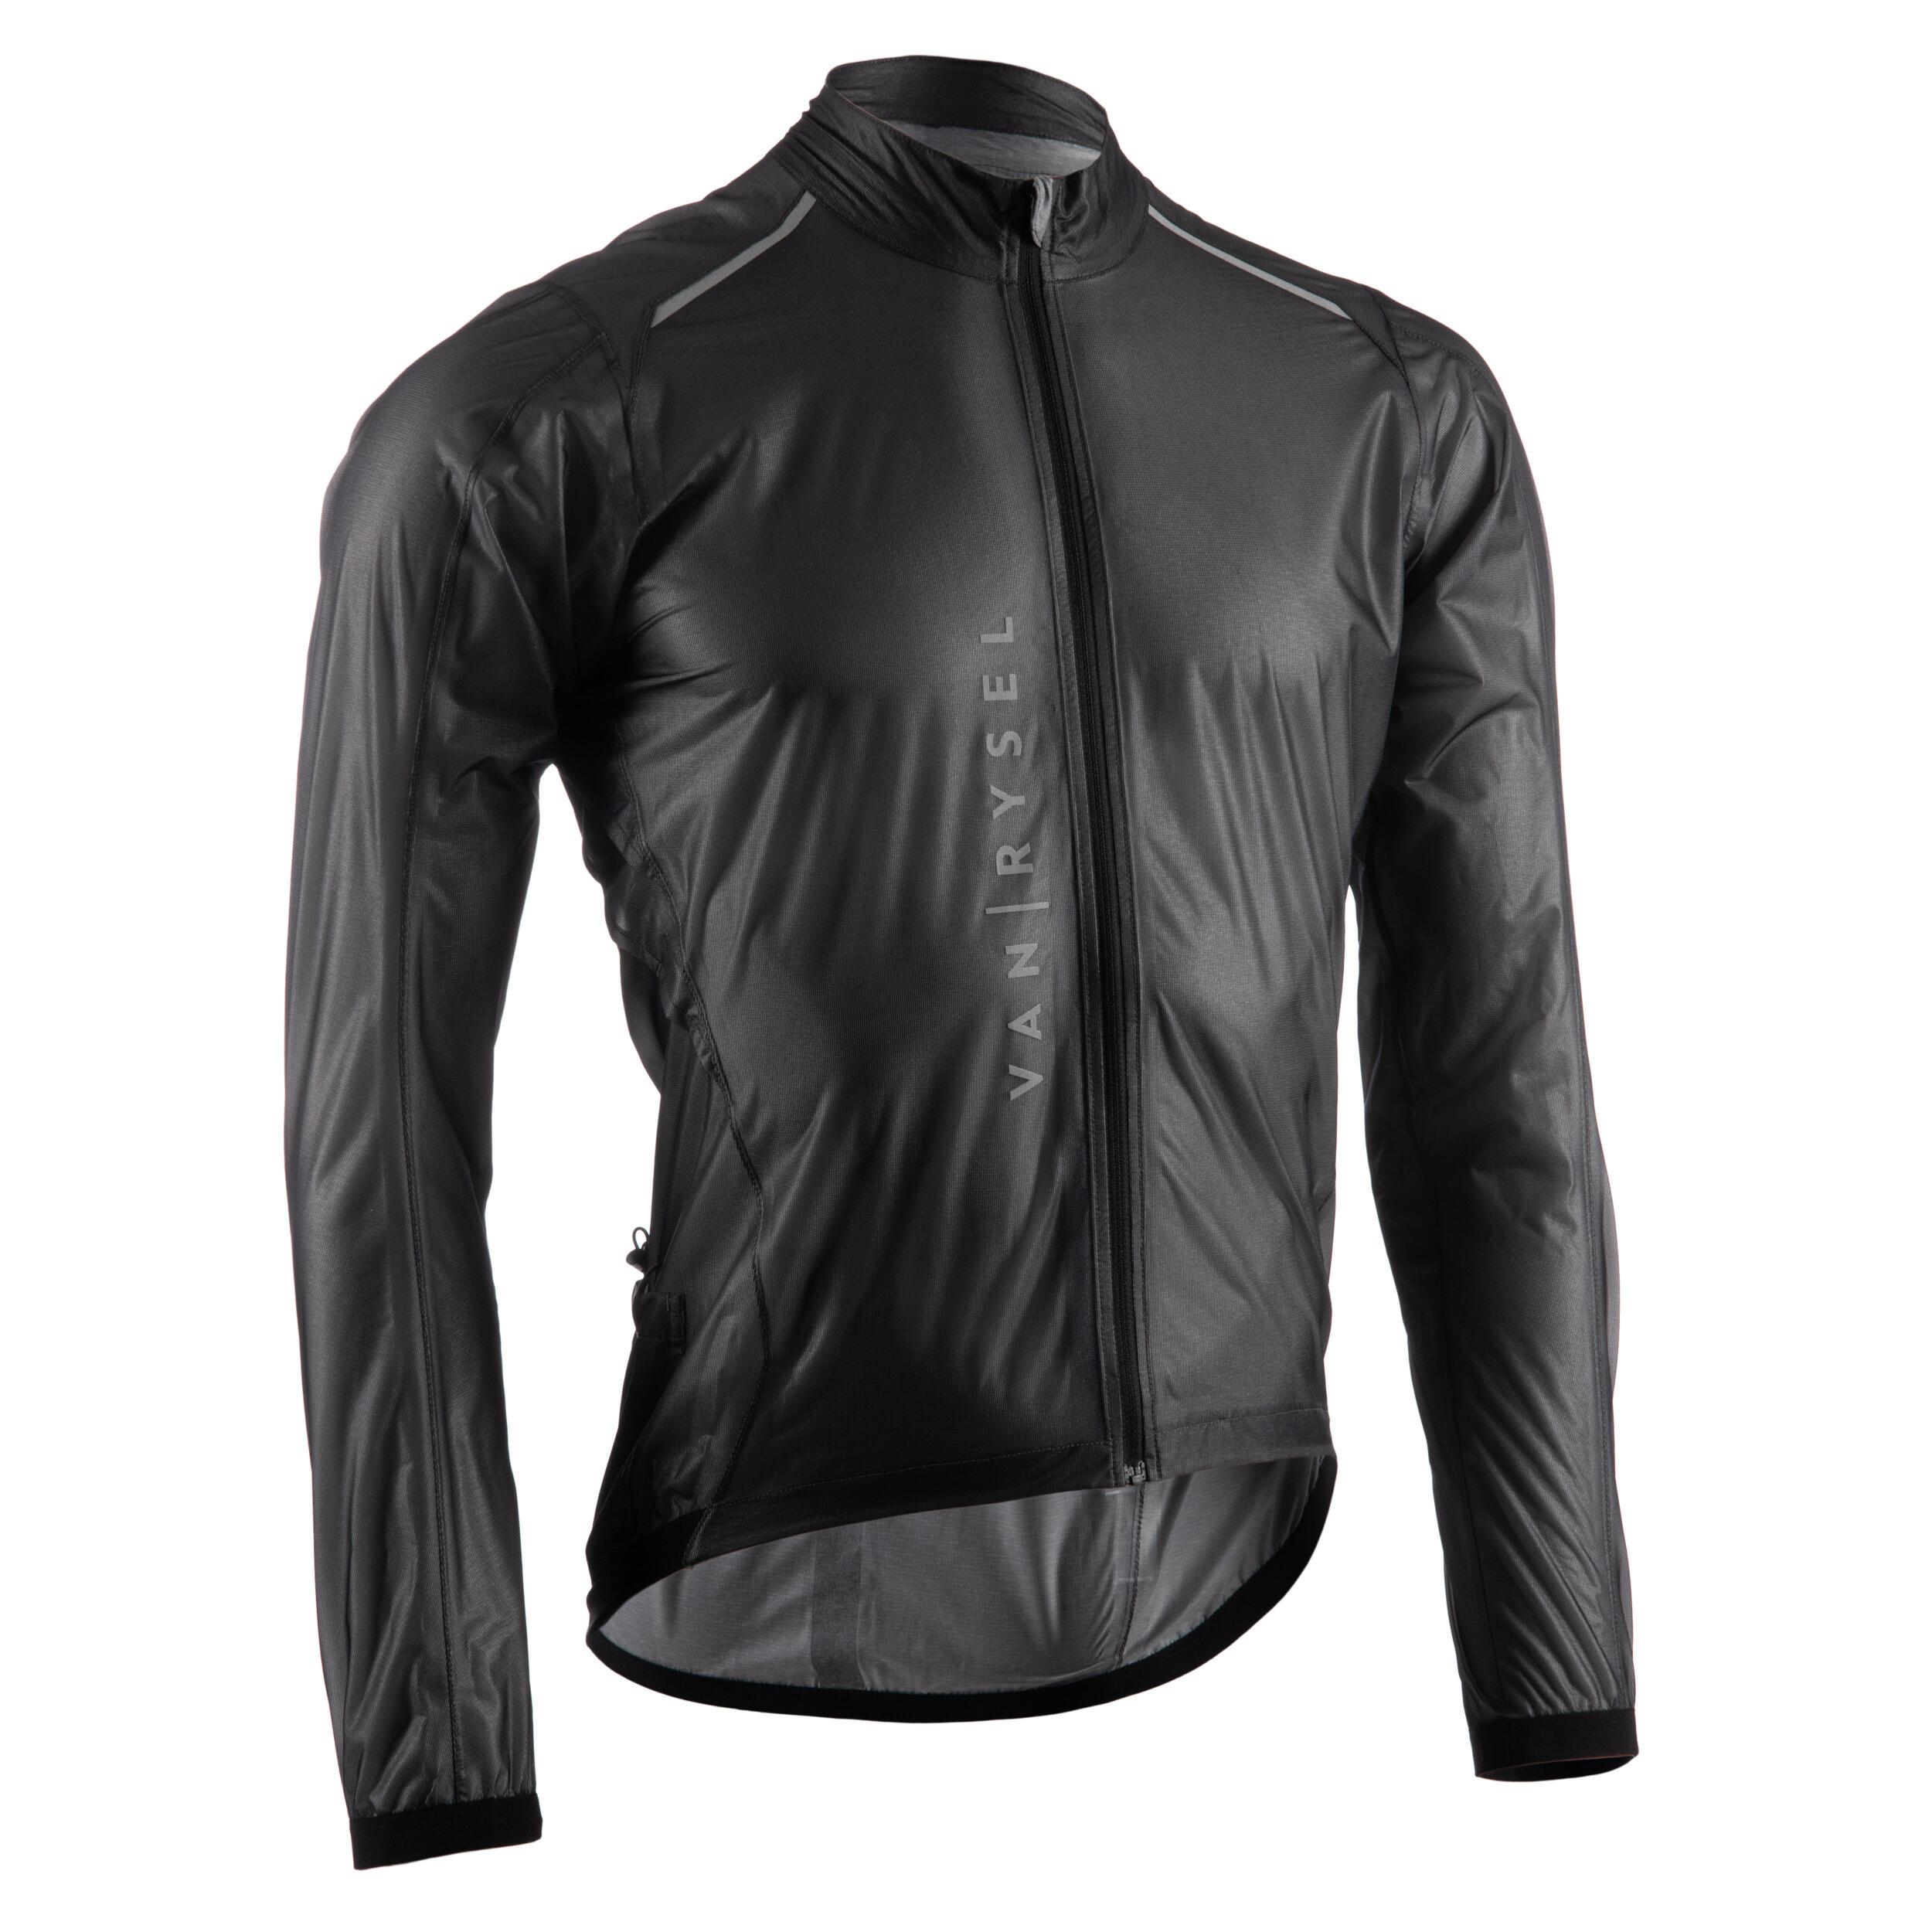 Jachetă ploaie Ultralight